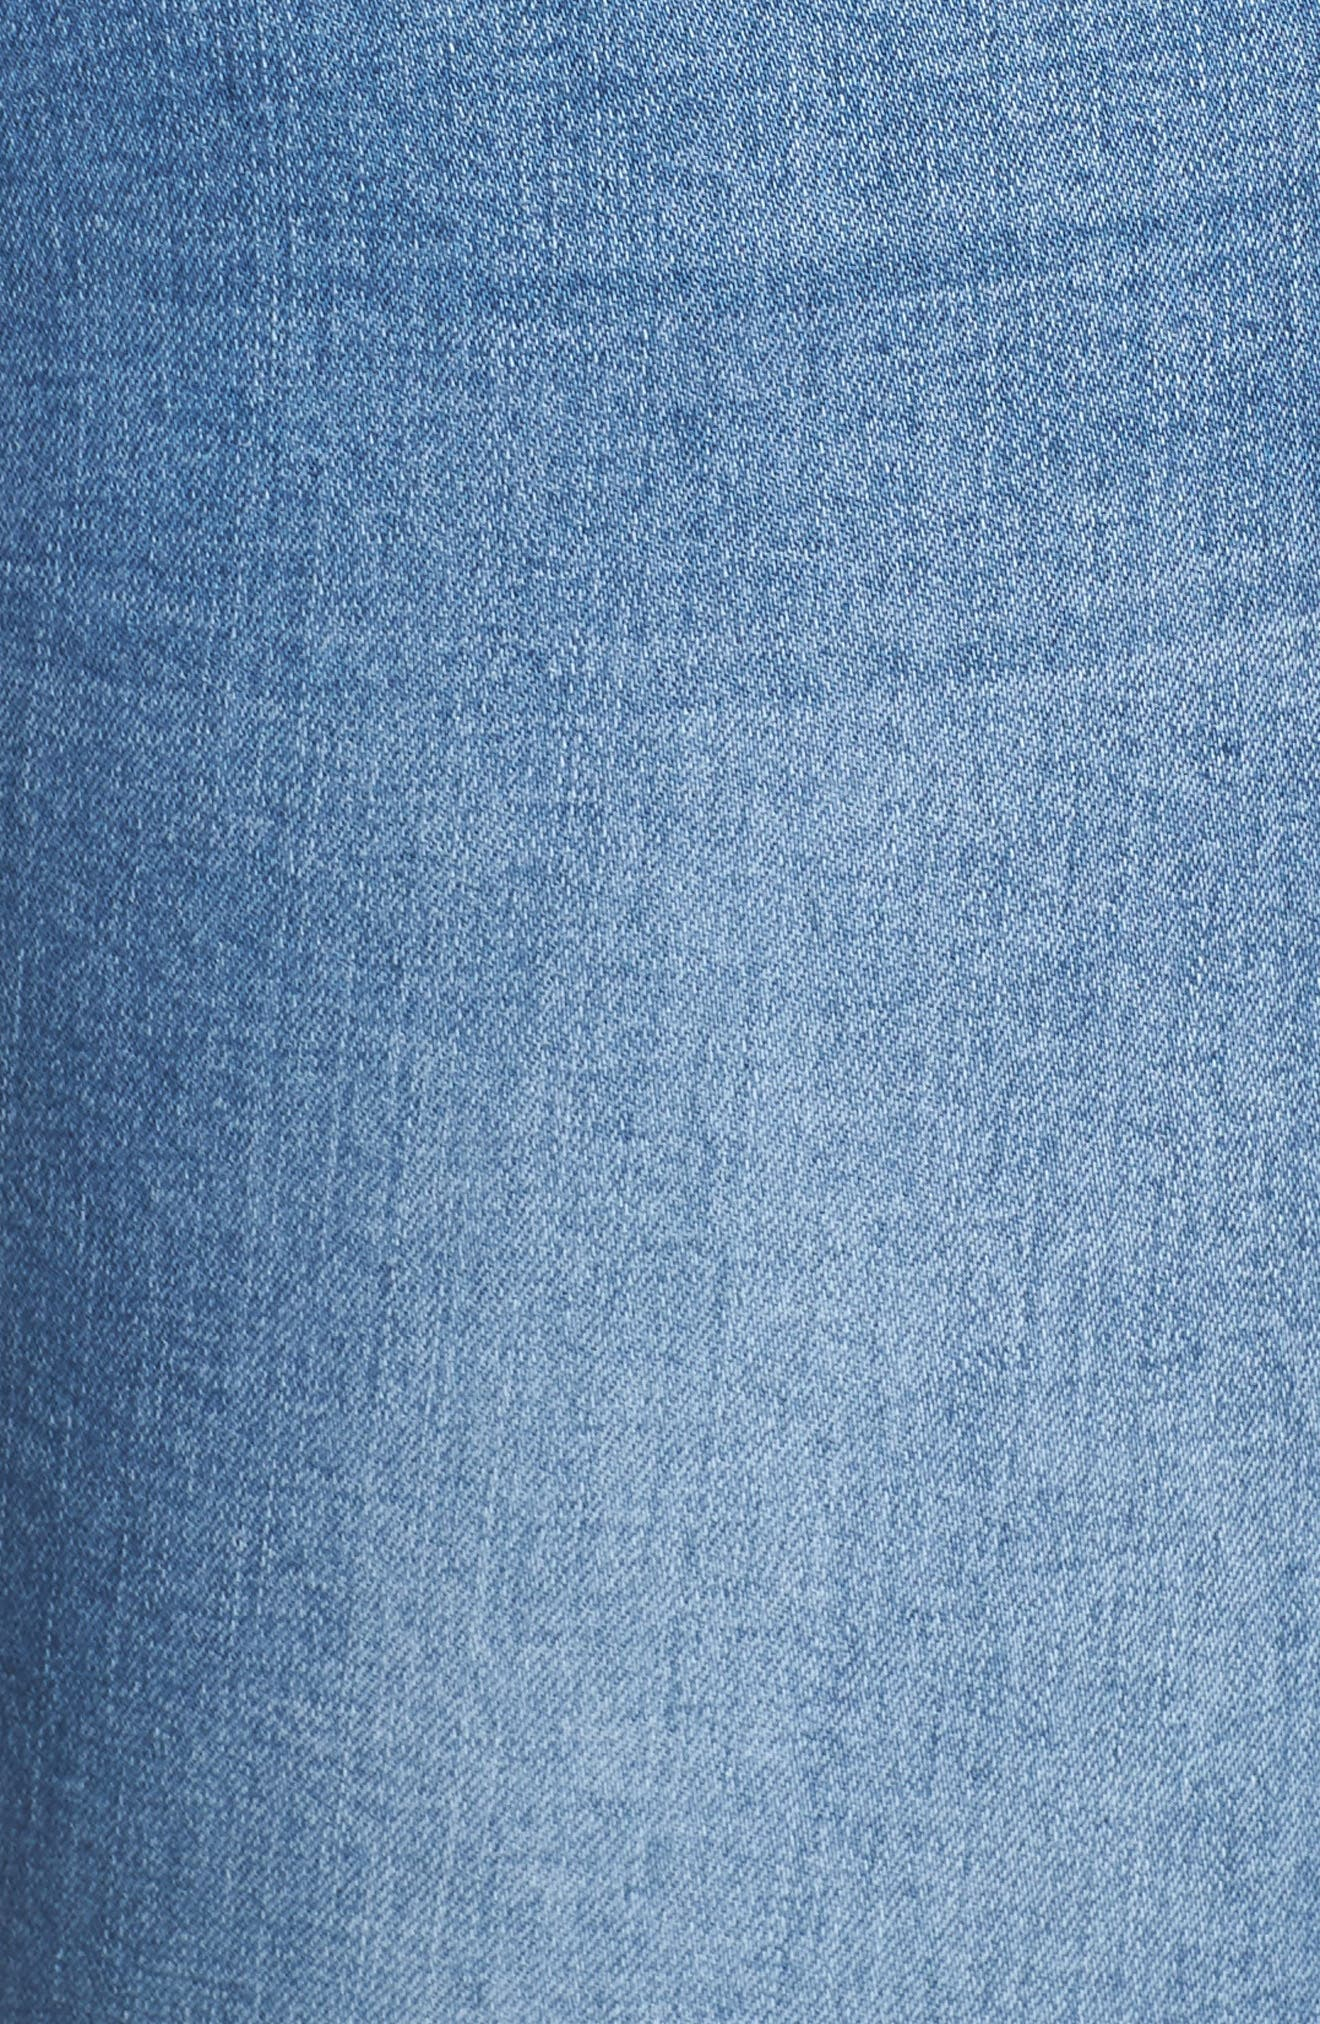 Summer Paradise Embroidered Stretch Skinny Jeans,                             Alternate thumbnail 6, color,                             Light Denim